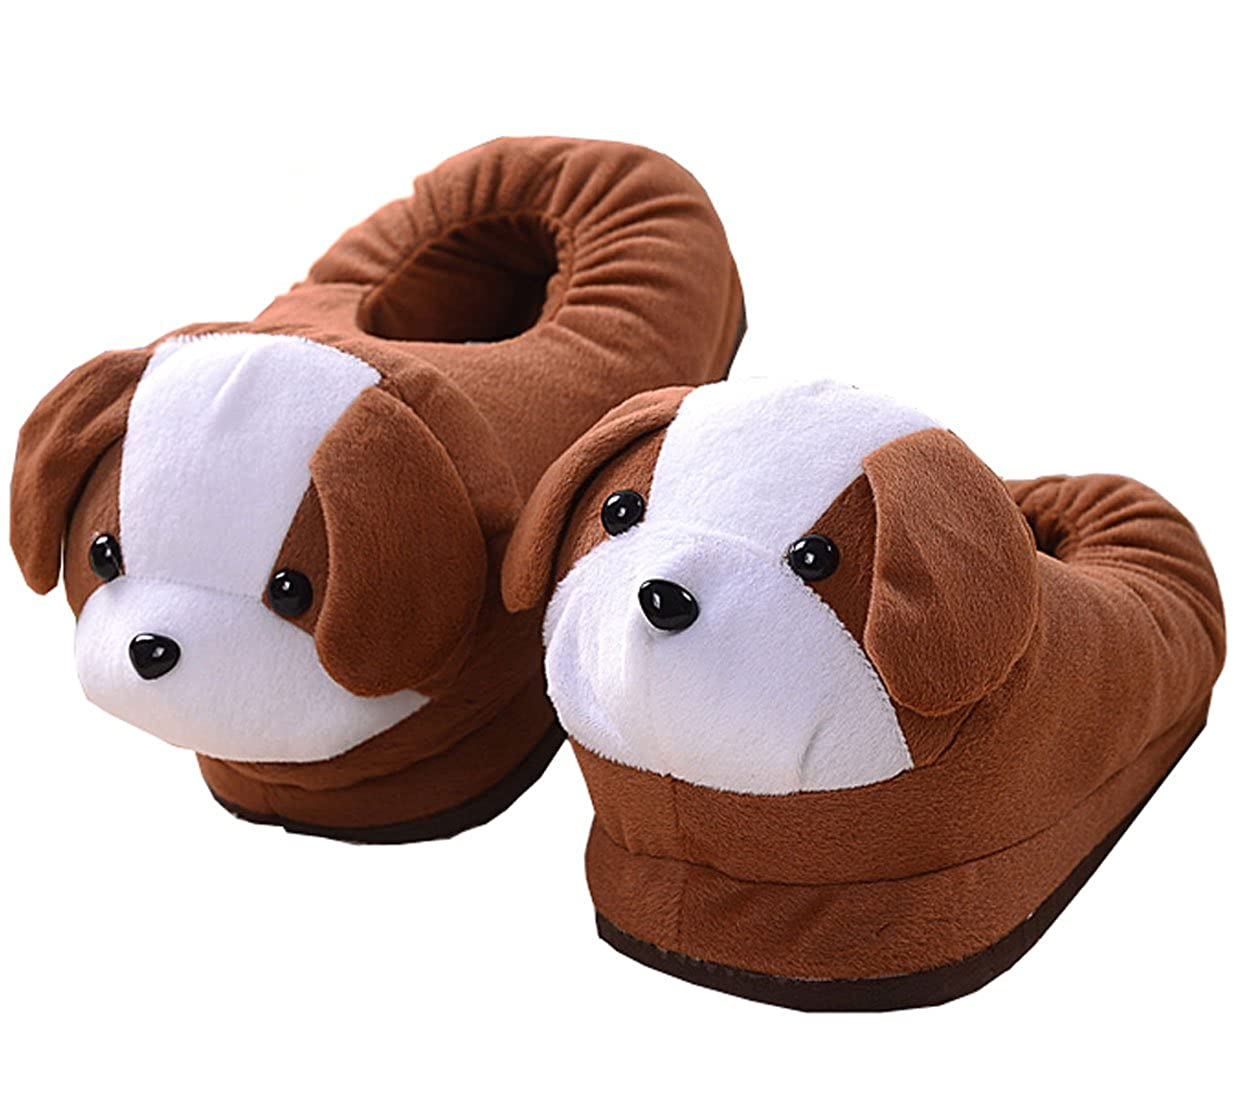 Cosnew Antiskid Coffee Color Dog Soft Plush Winter Warm Slippers